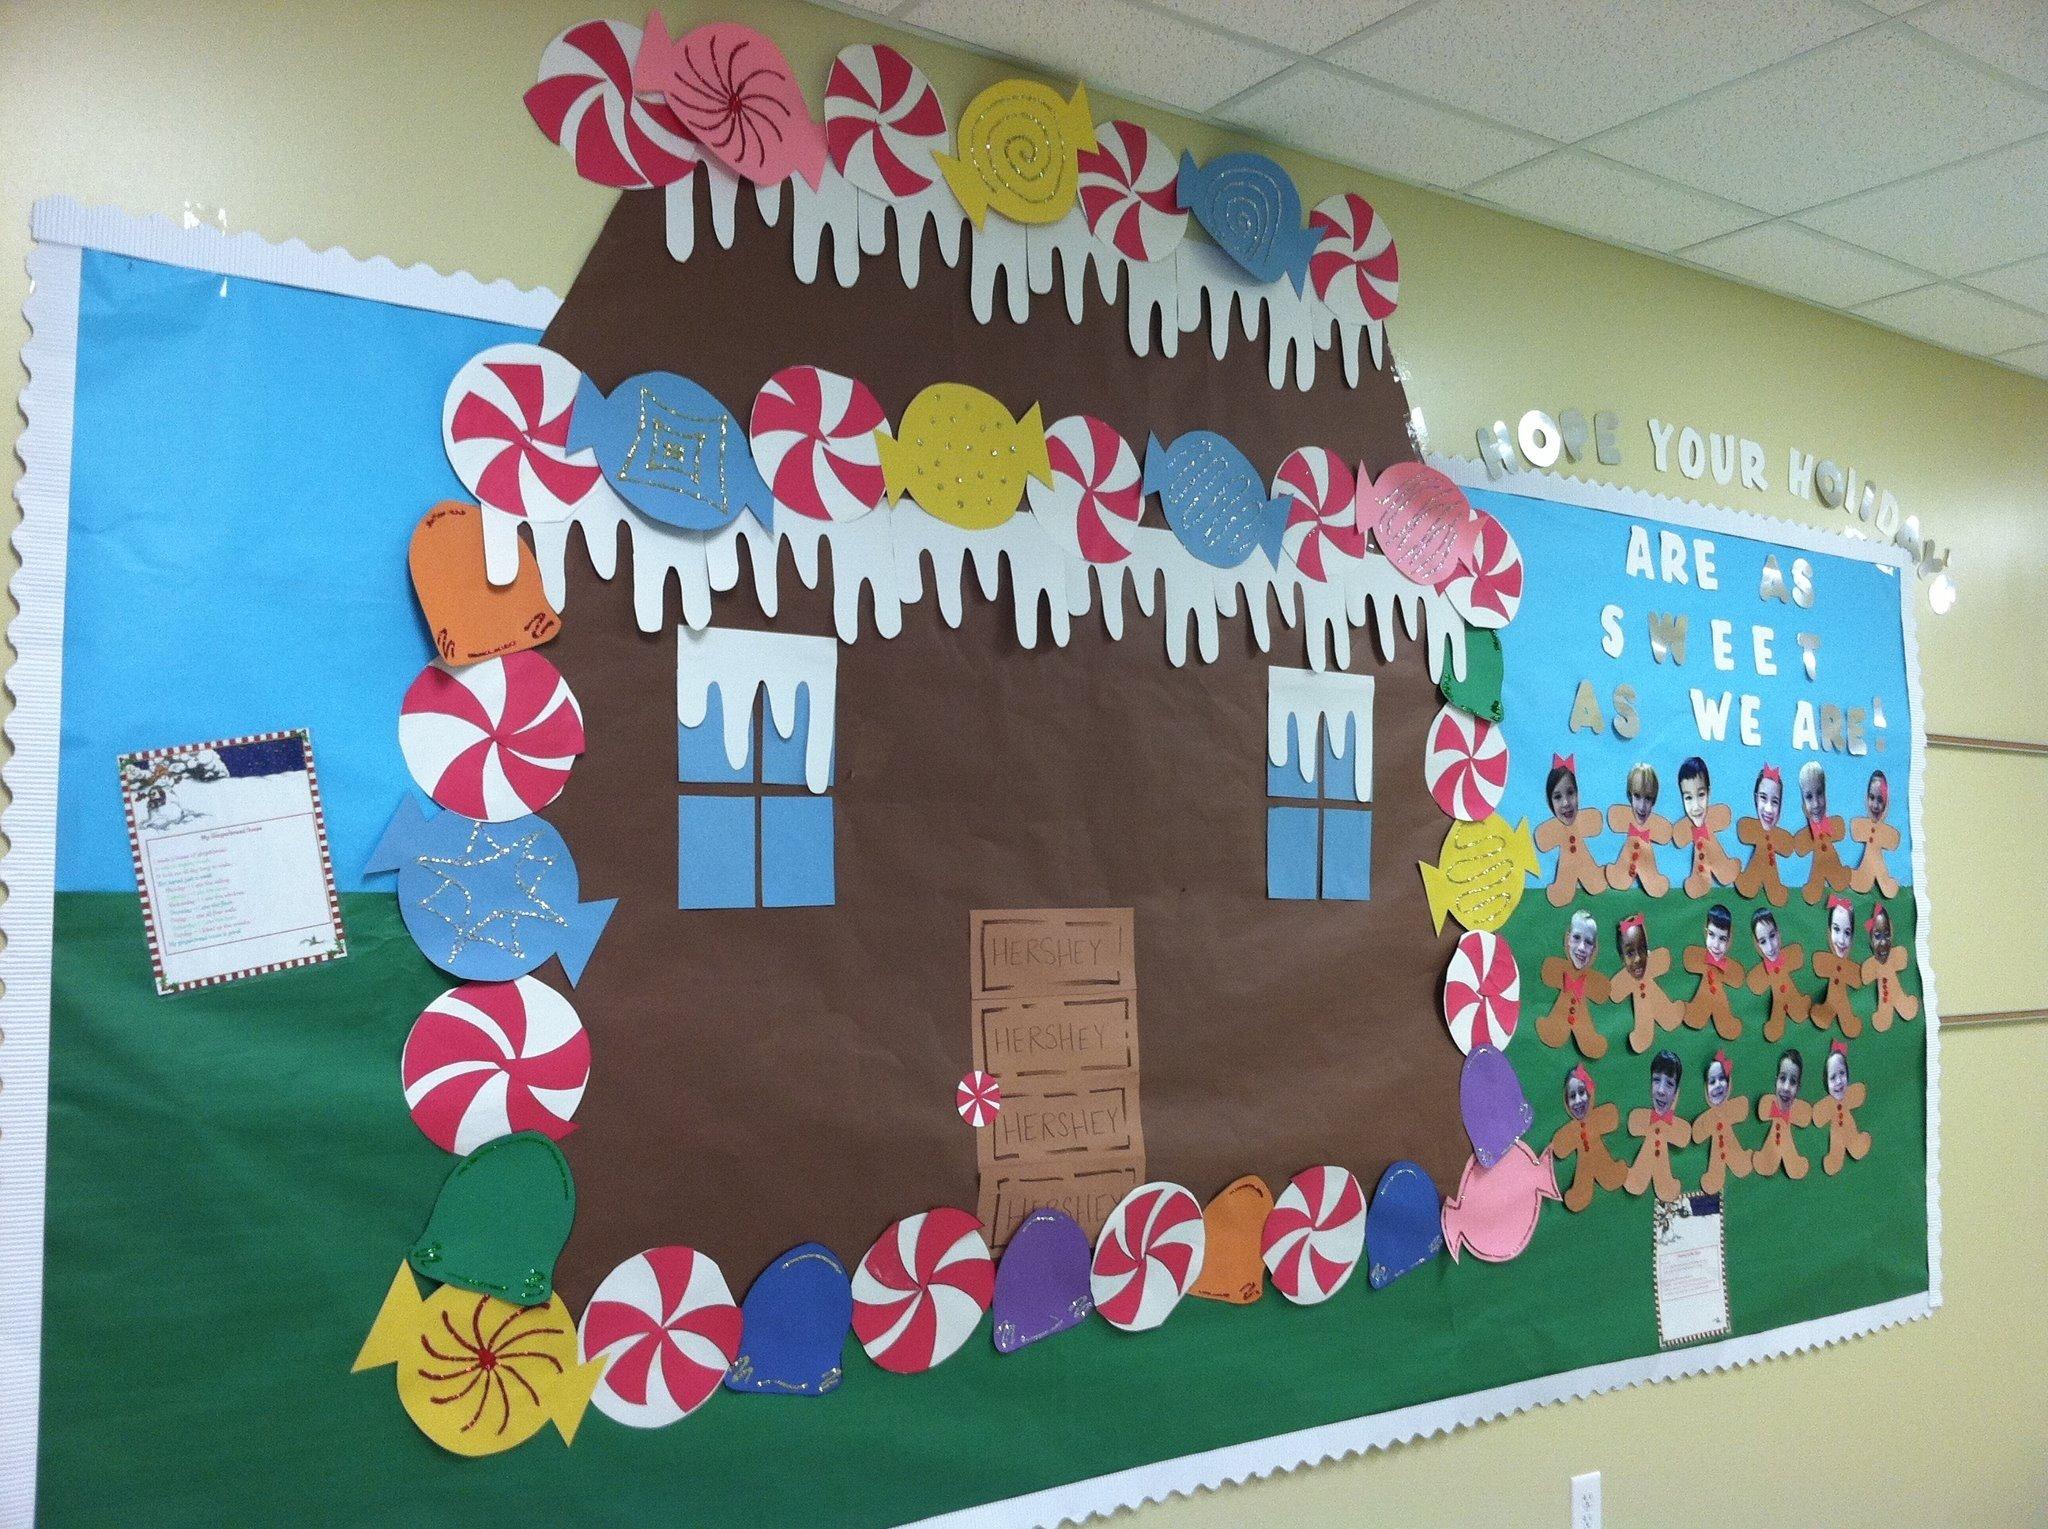 10 Perfect Gingerbread Man Bulletin Board Ideas winter bulletin board idea like the gingerbread housecaption 1 2020